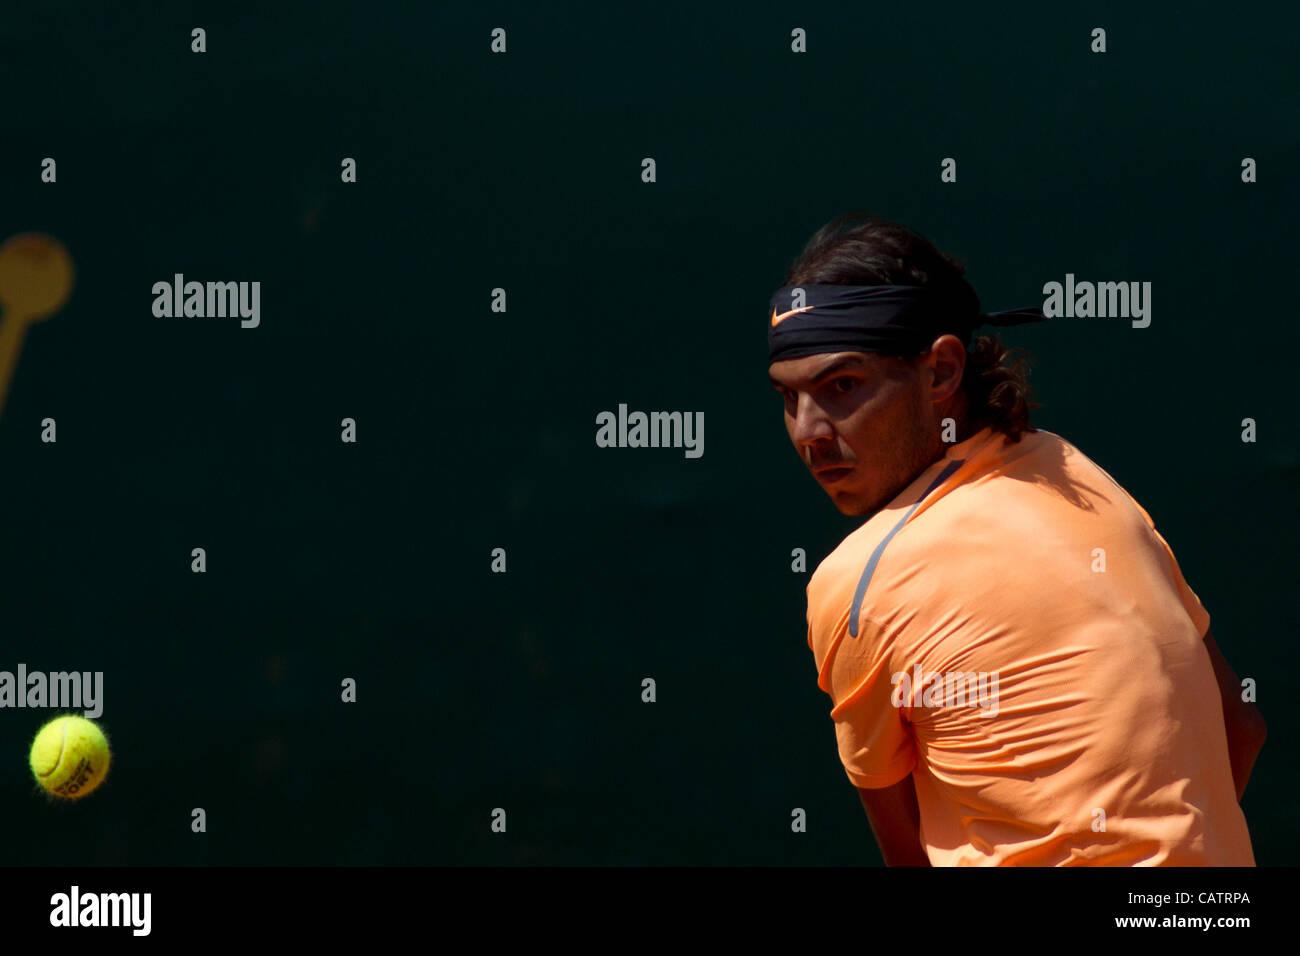 22/04/2012 Monte Carlo, Monaco. Rafael Nadal (ESP) in action during the final singles match between Novak Djokovic - Stock Image